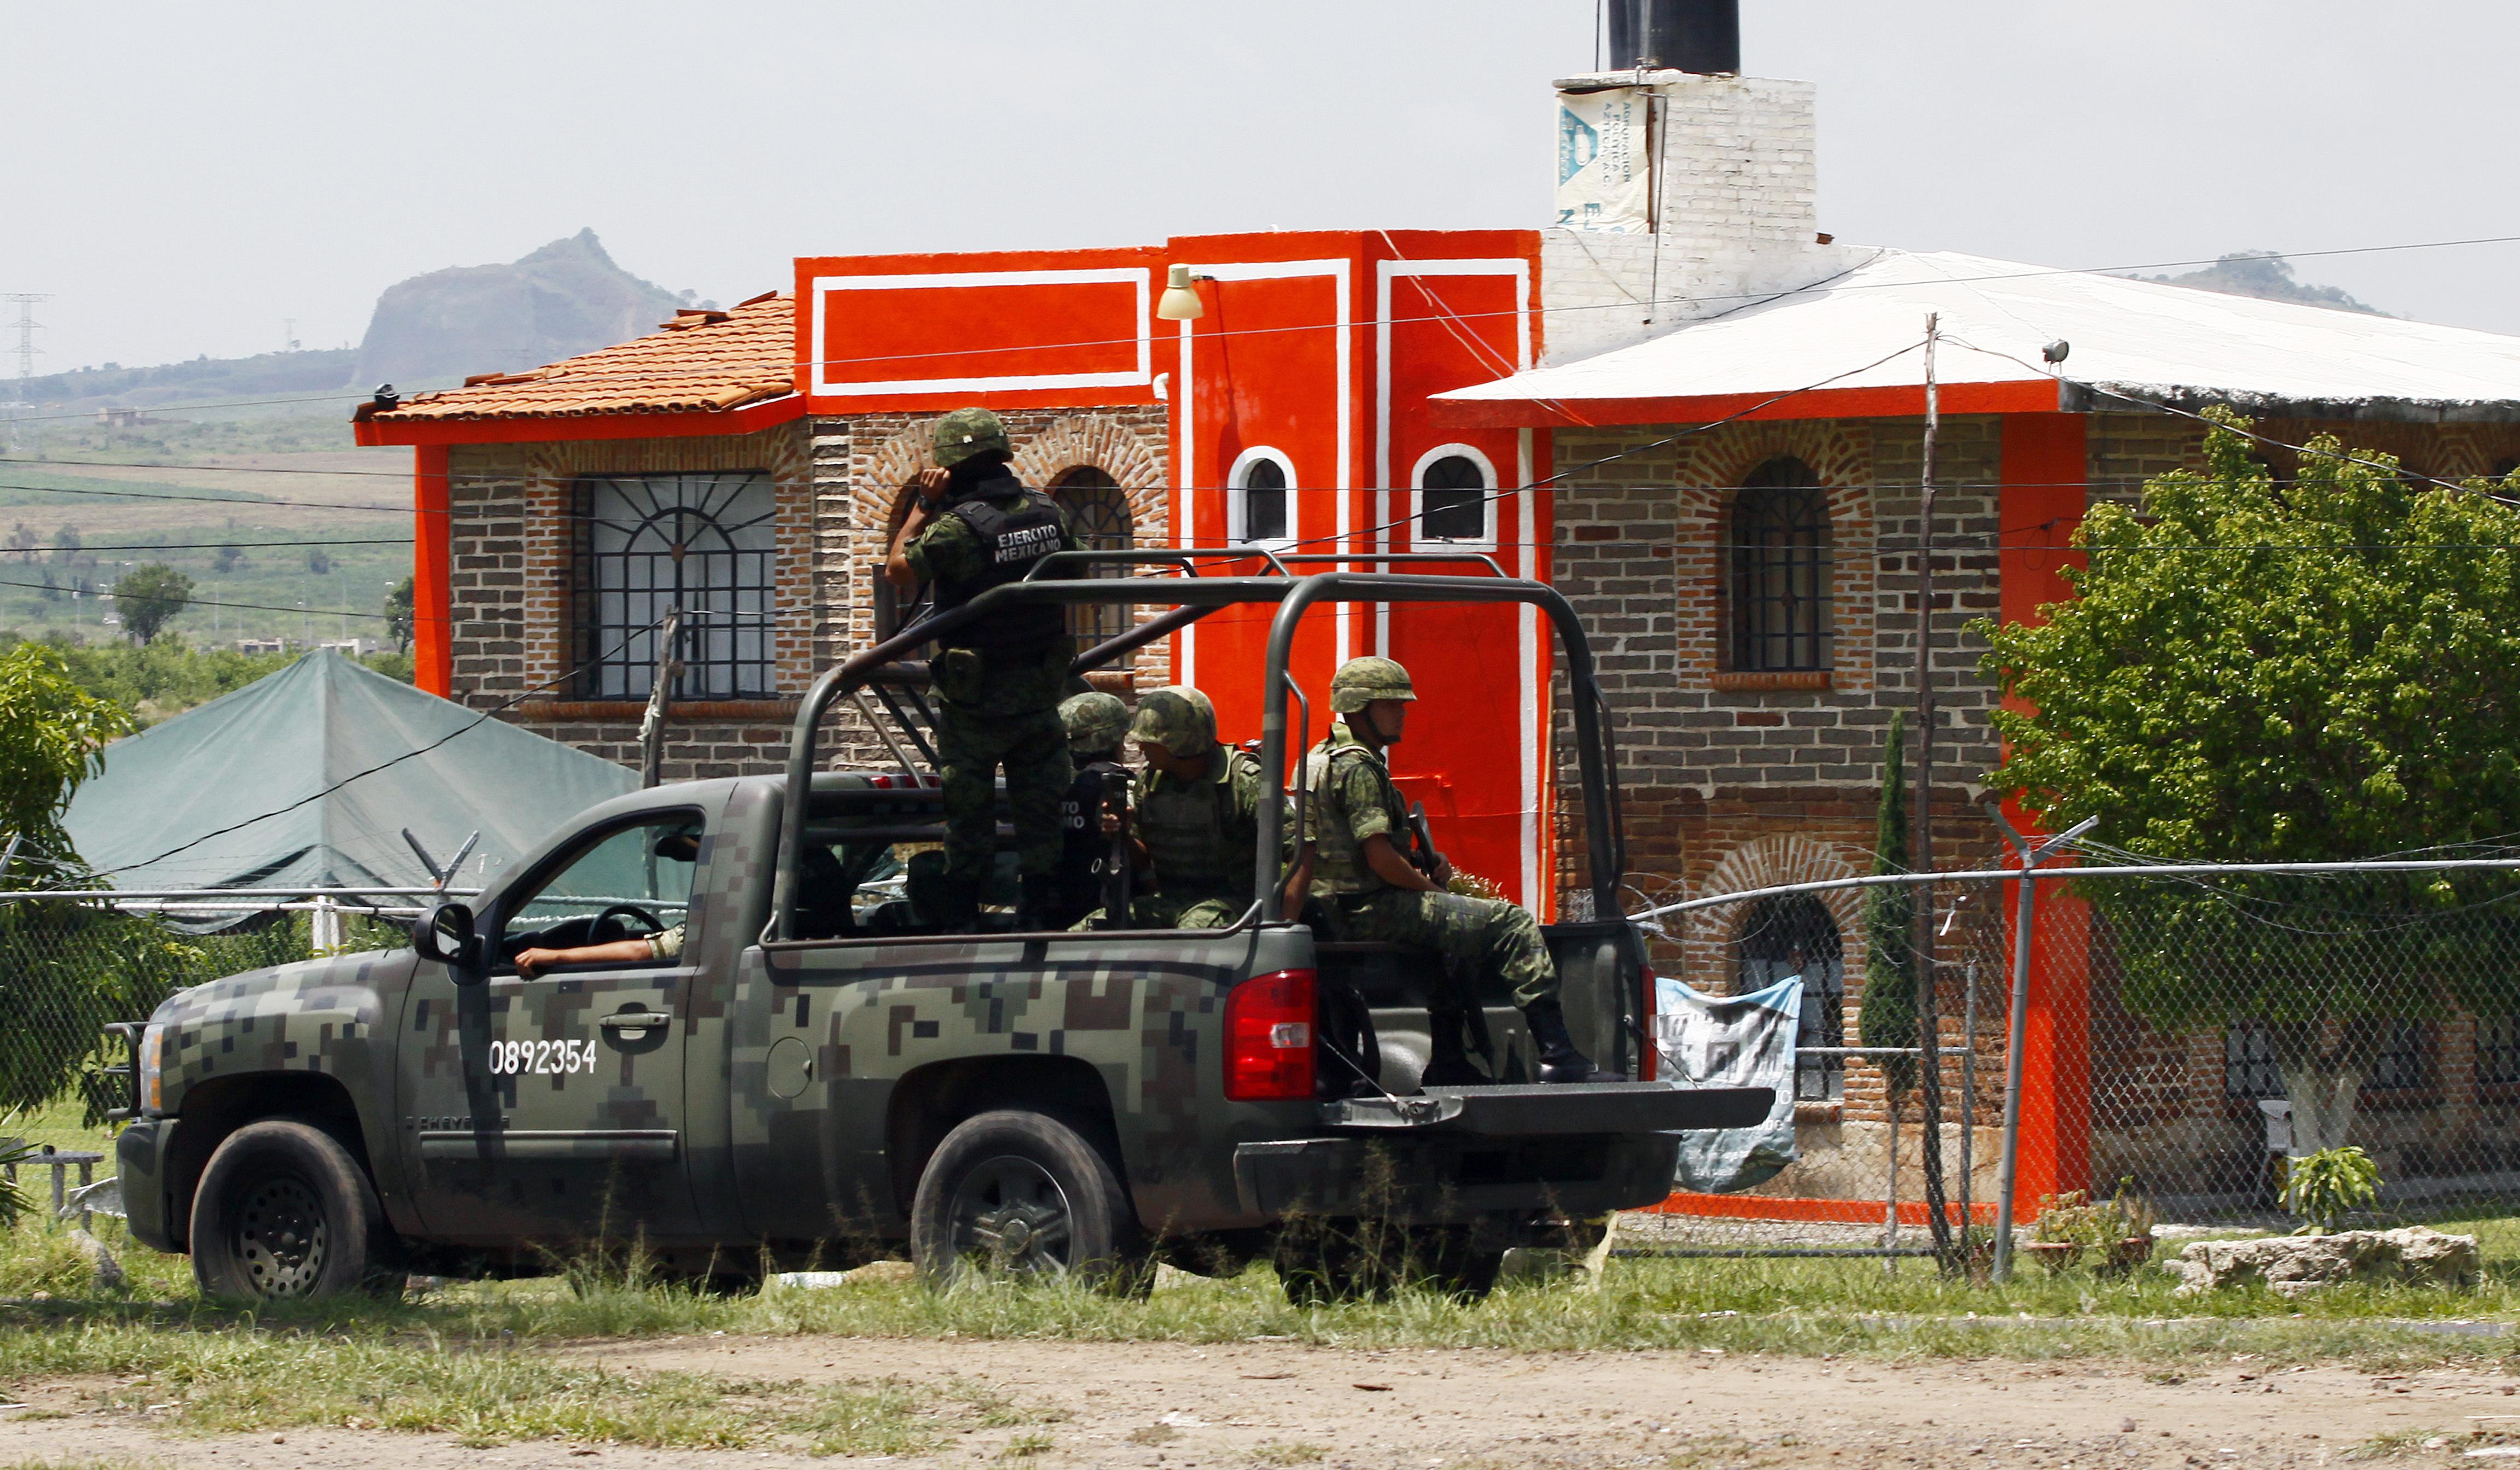 Soldiers patrol the Puente Grande State prison where Mexican cartel boss Rafael Caro Quintero was jailed in Zapotlanejo, Jalisco State, Mexico, on Aug. 9, 2013.